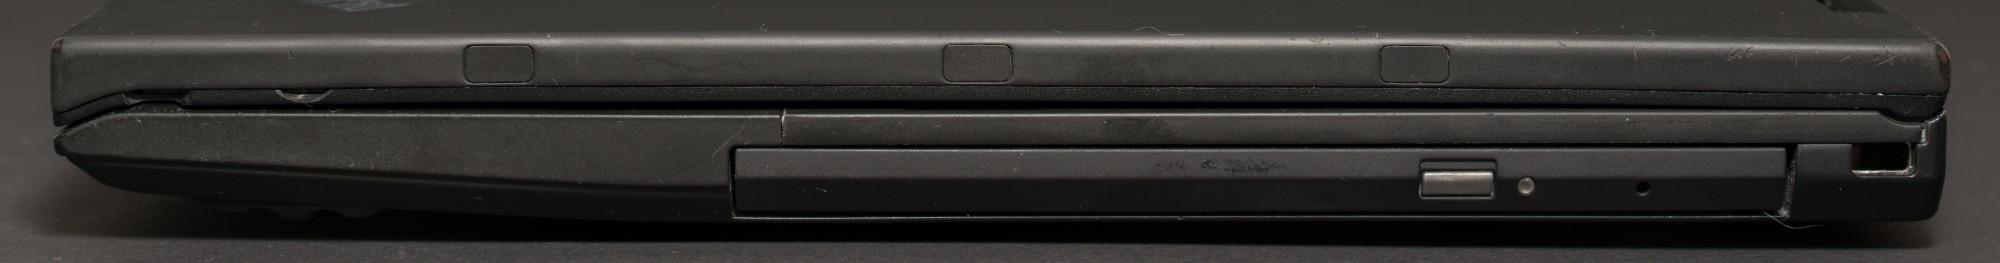 Древности: десять лет эволюции ноутбуков на примере ThinkPad X301 - 5